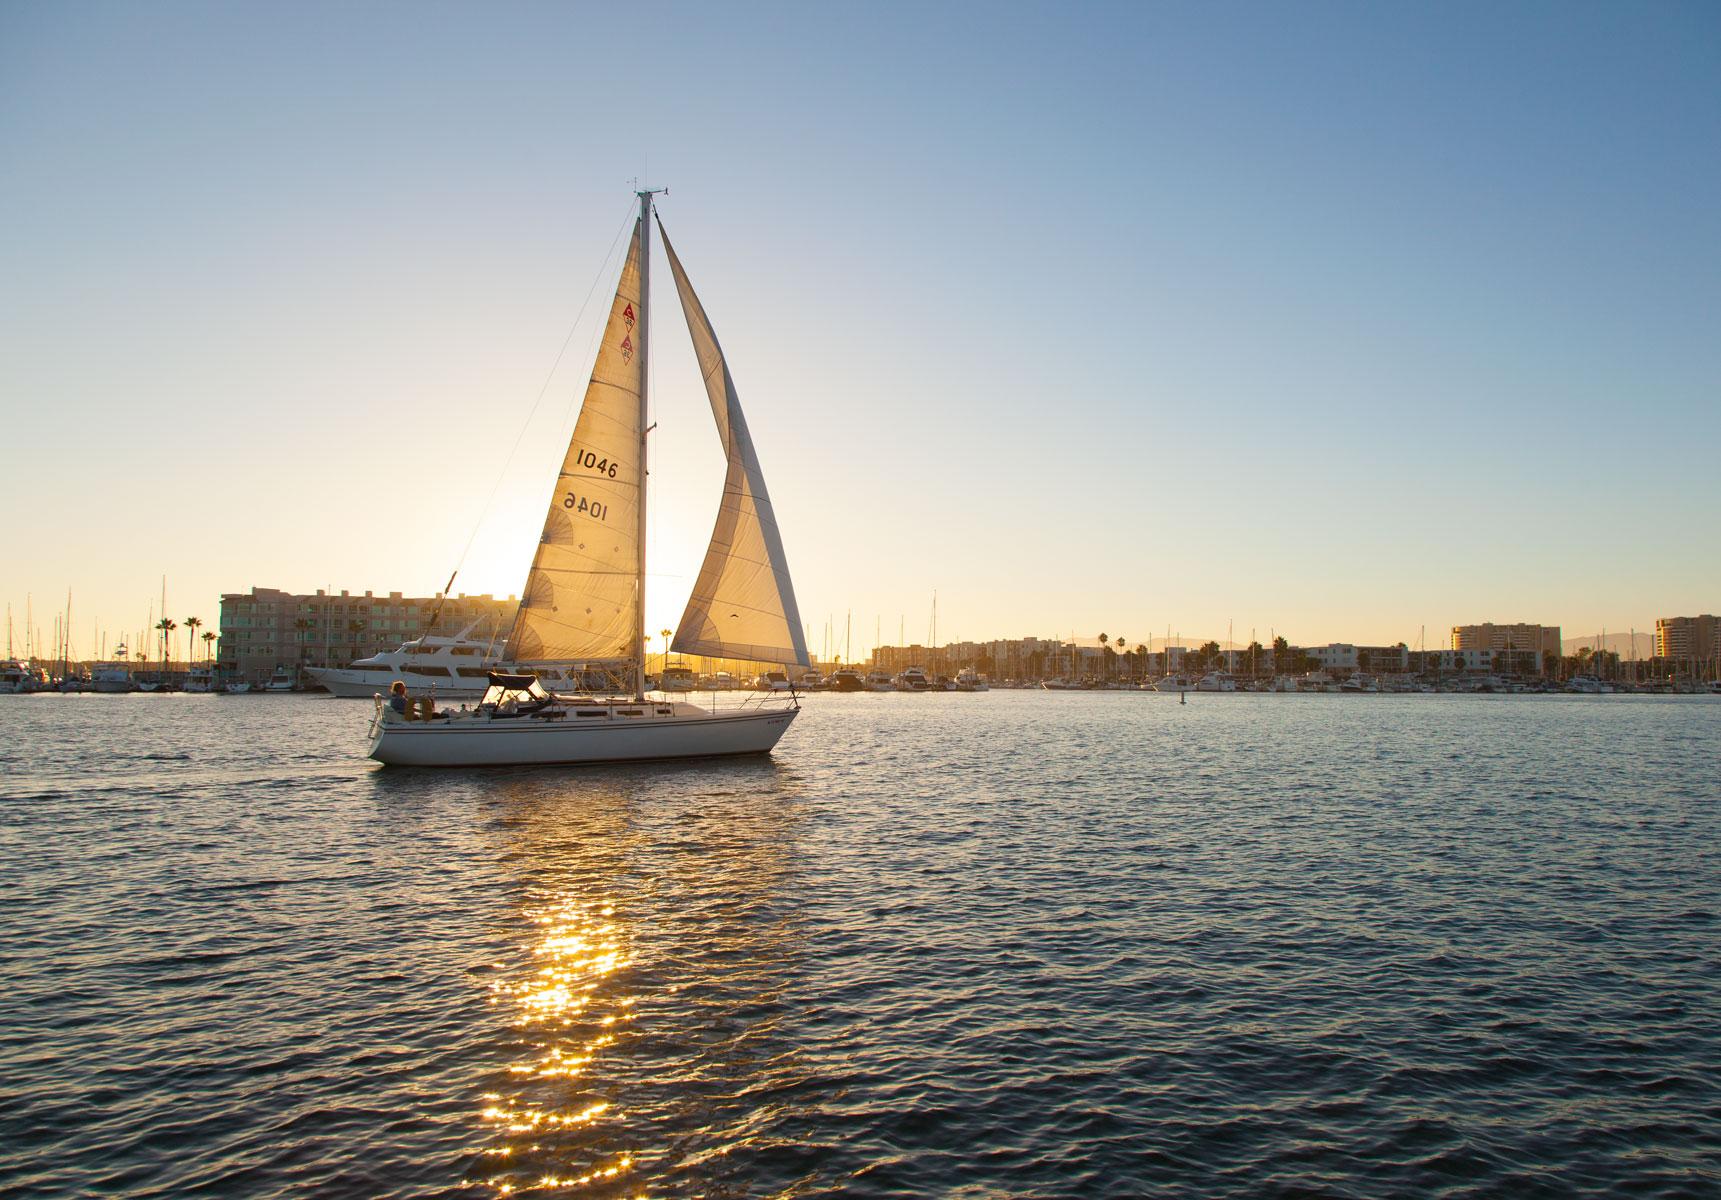 sunset_sail_in_the_marina_harbor_l.jpg